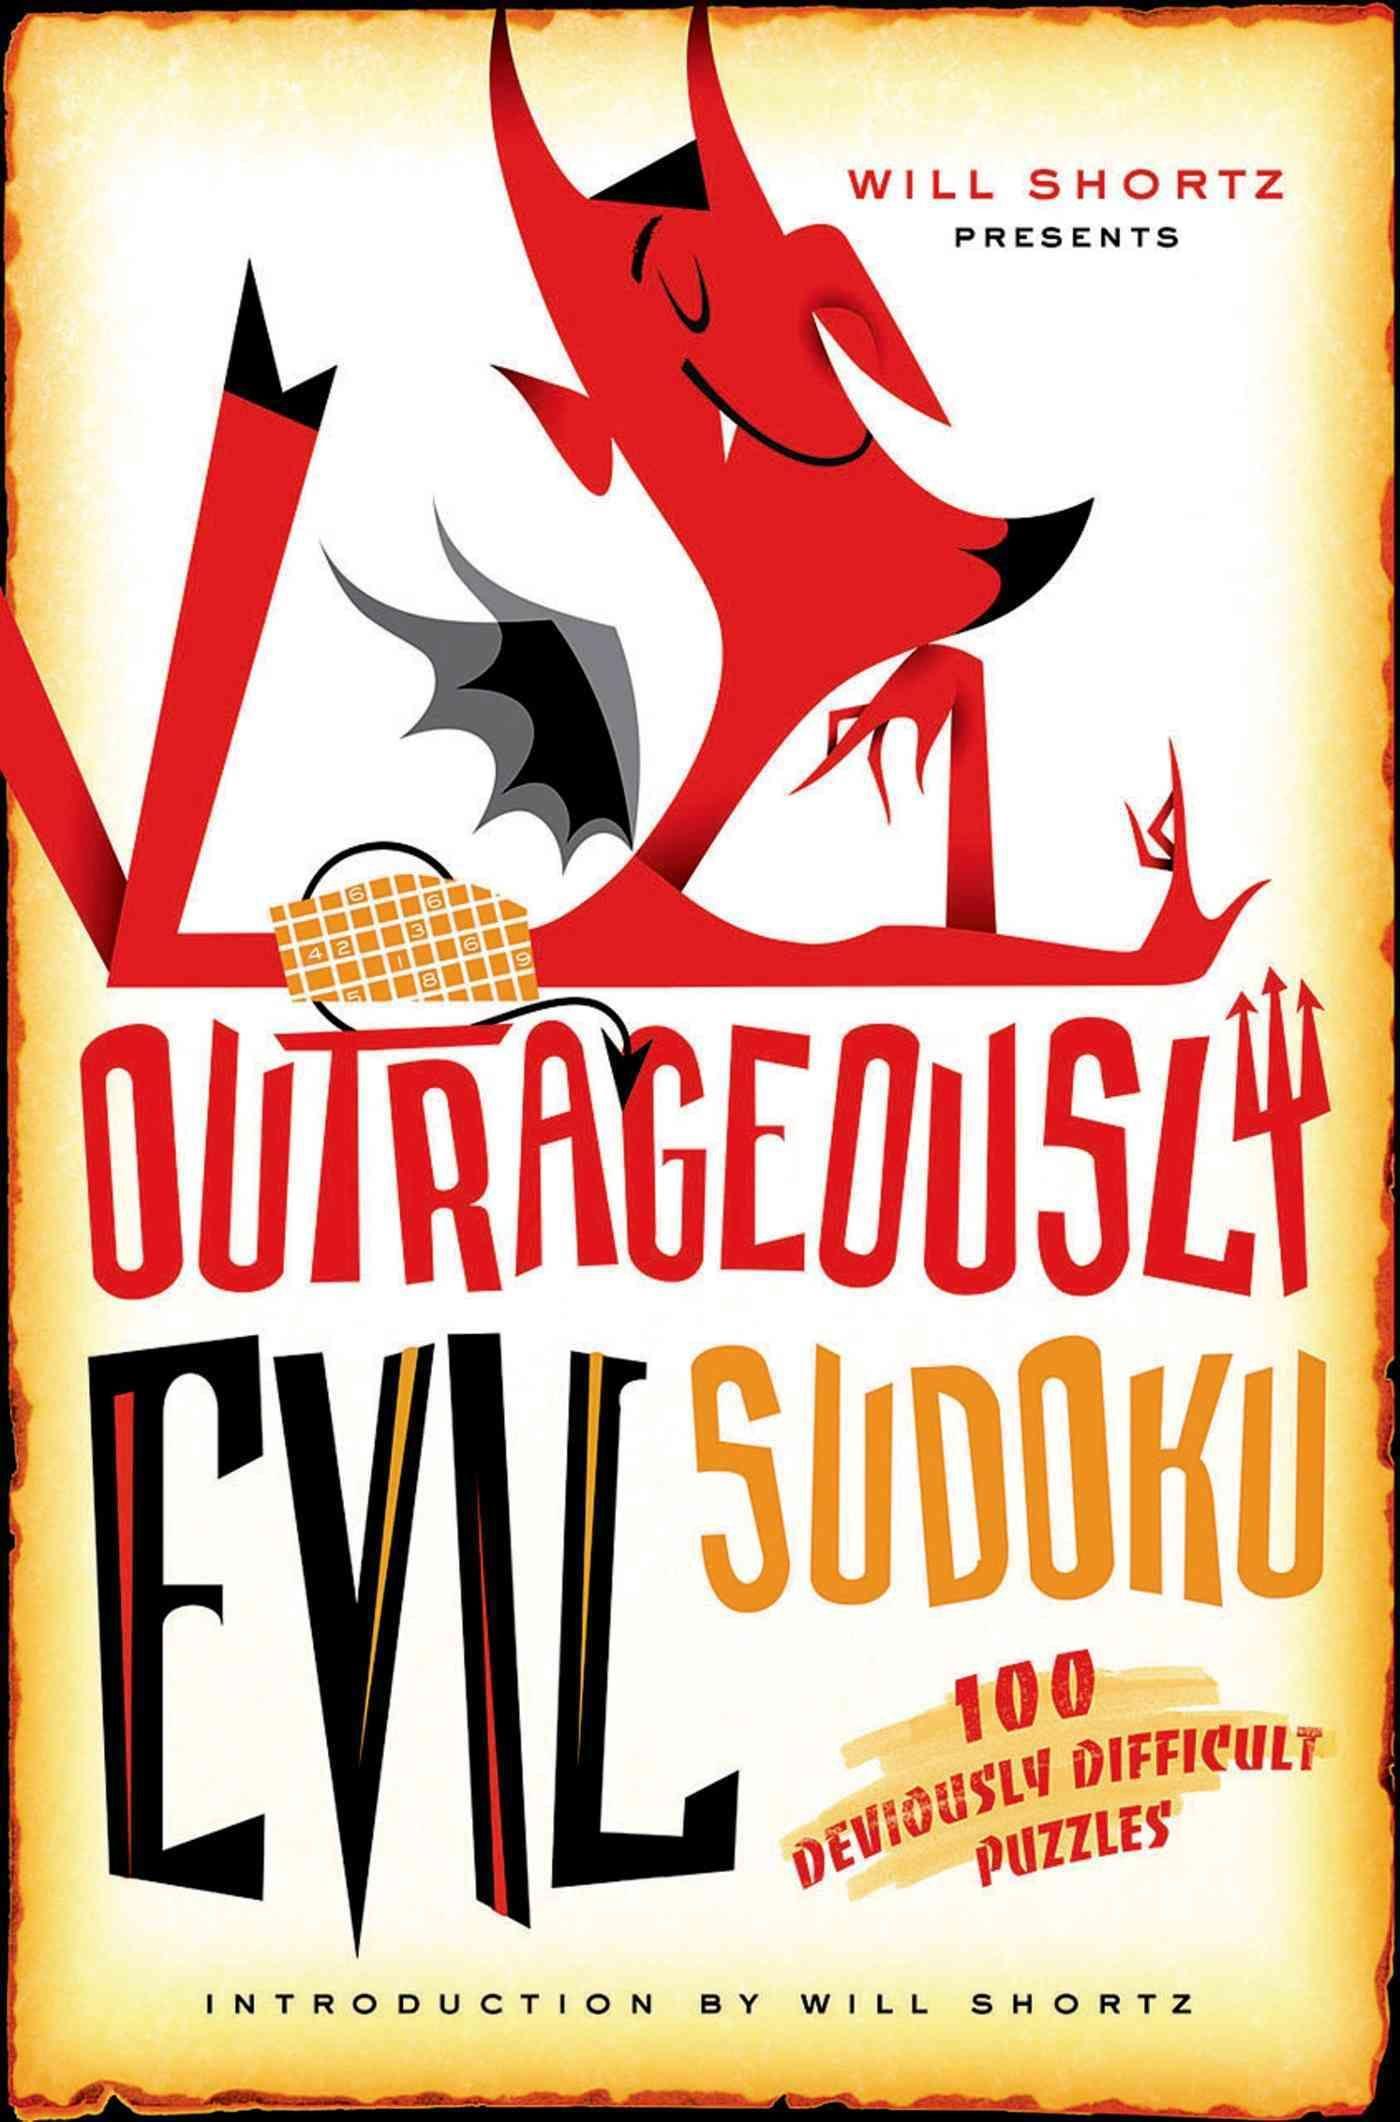 Will Shortz Presents Outrageously Evil Sudoku 100